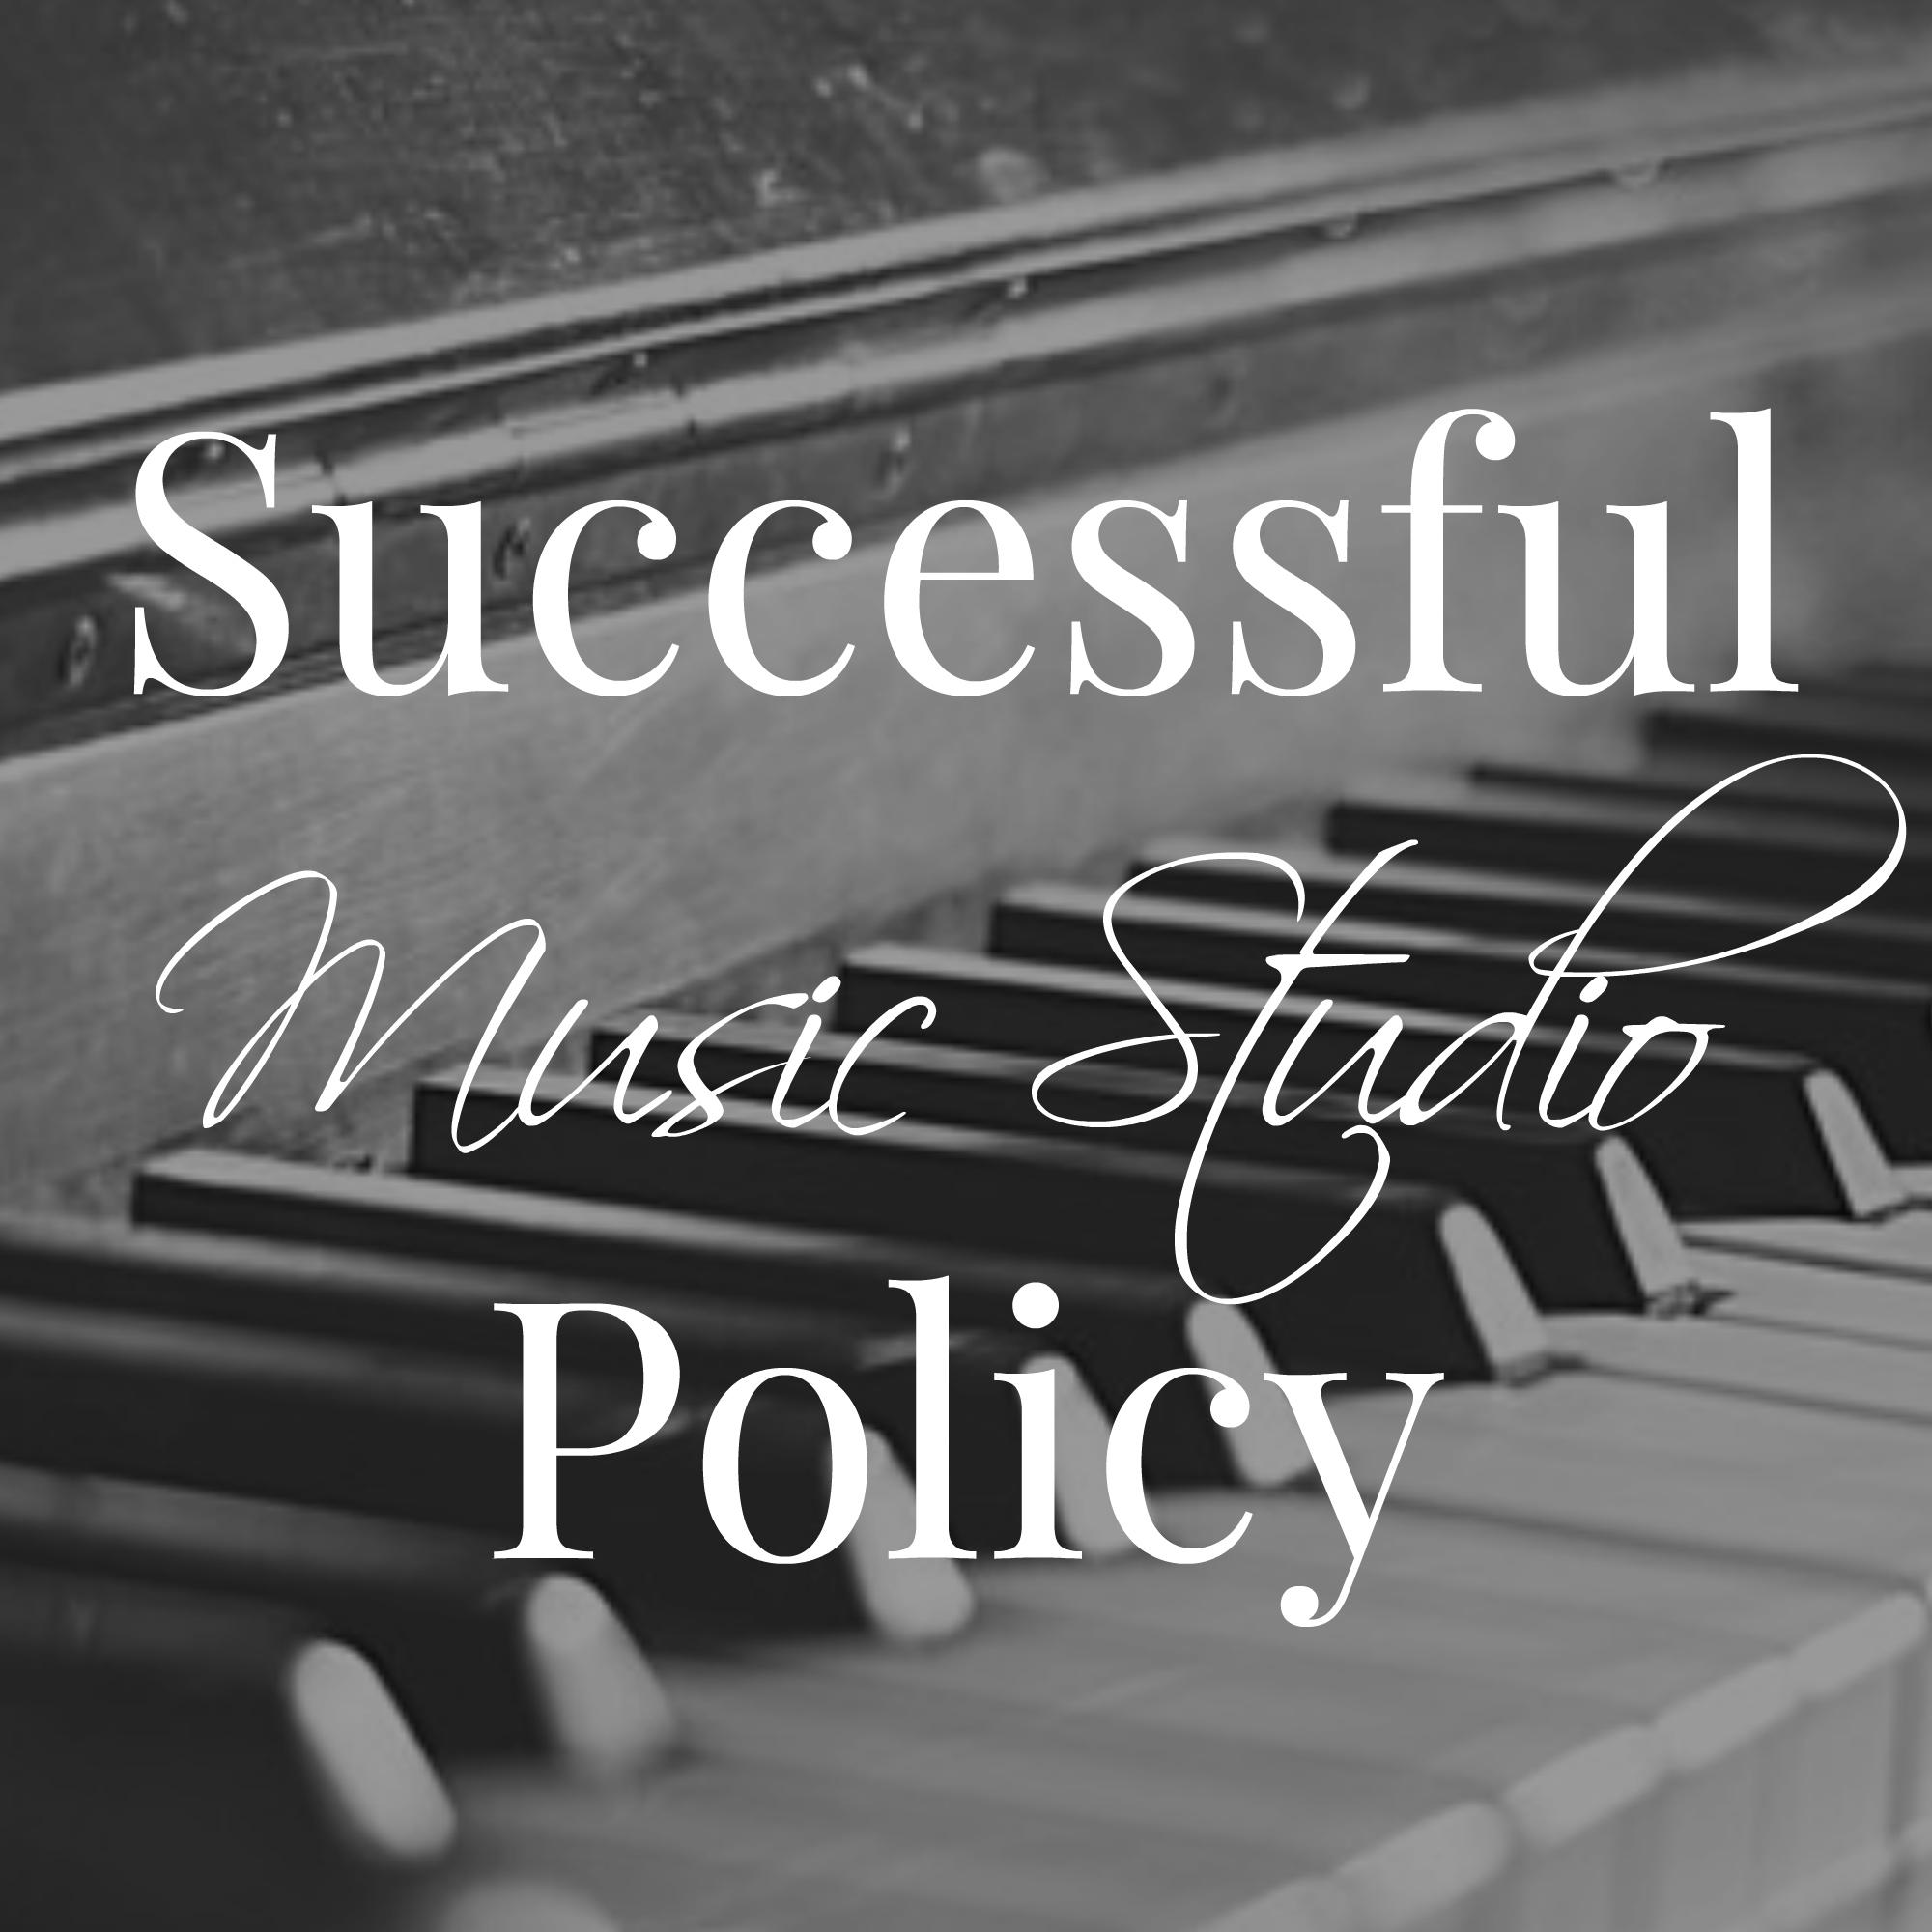 Customizable Studio Policy -